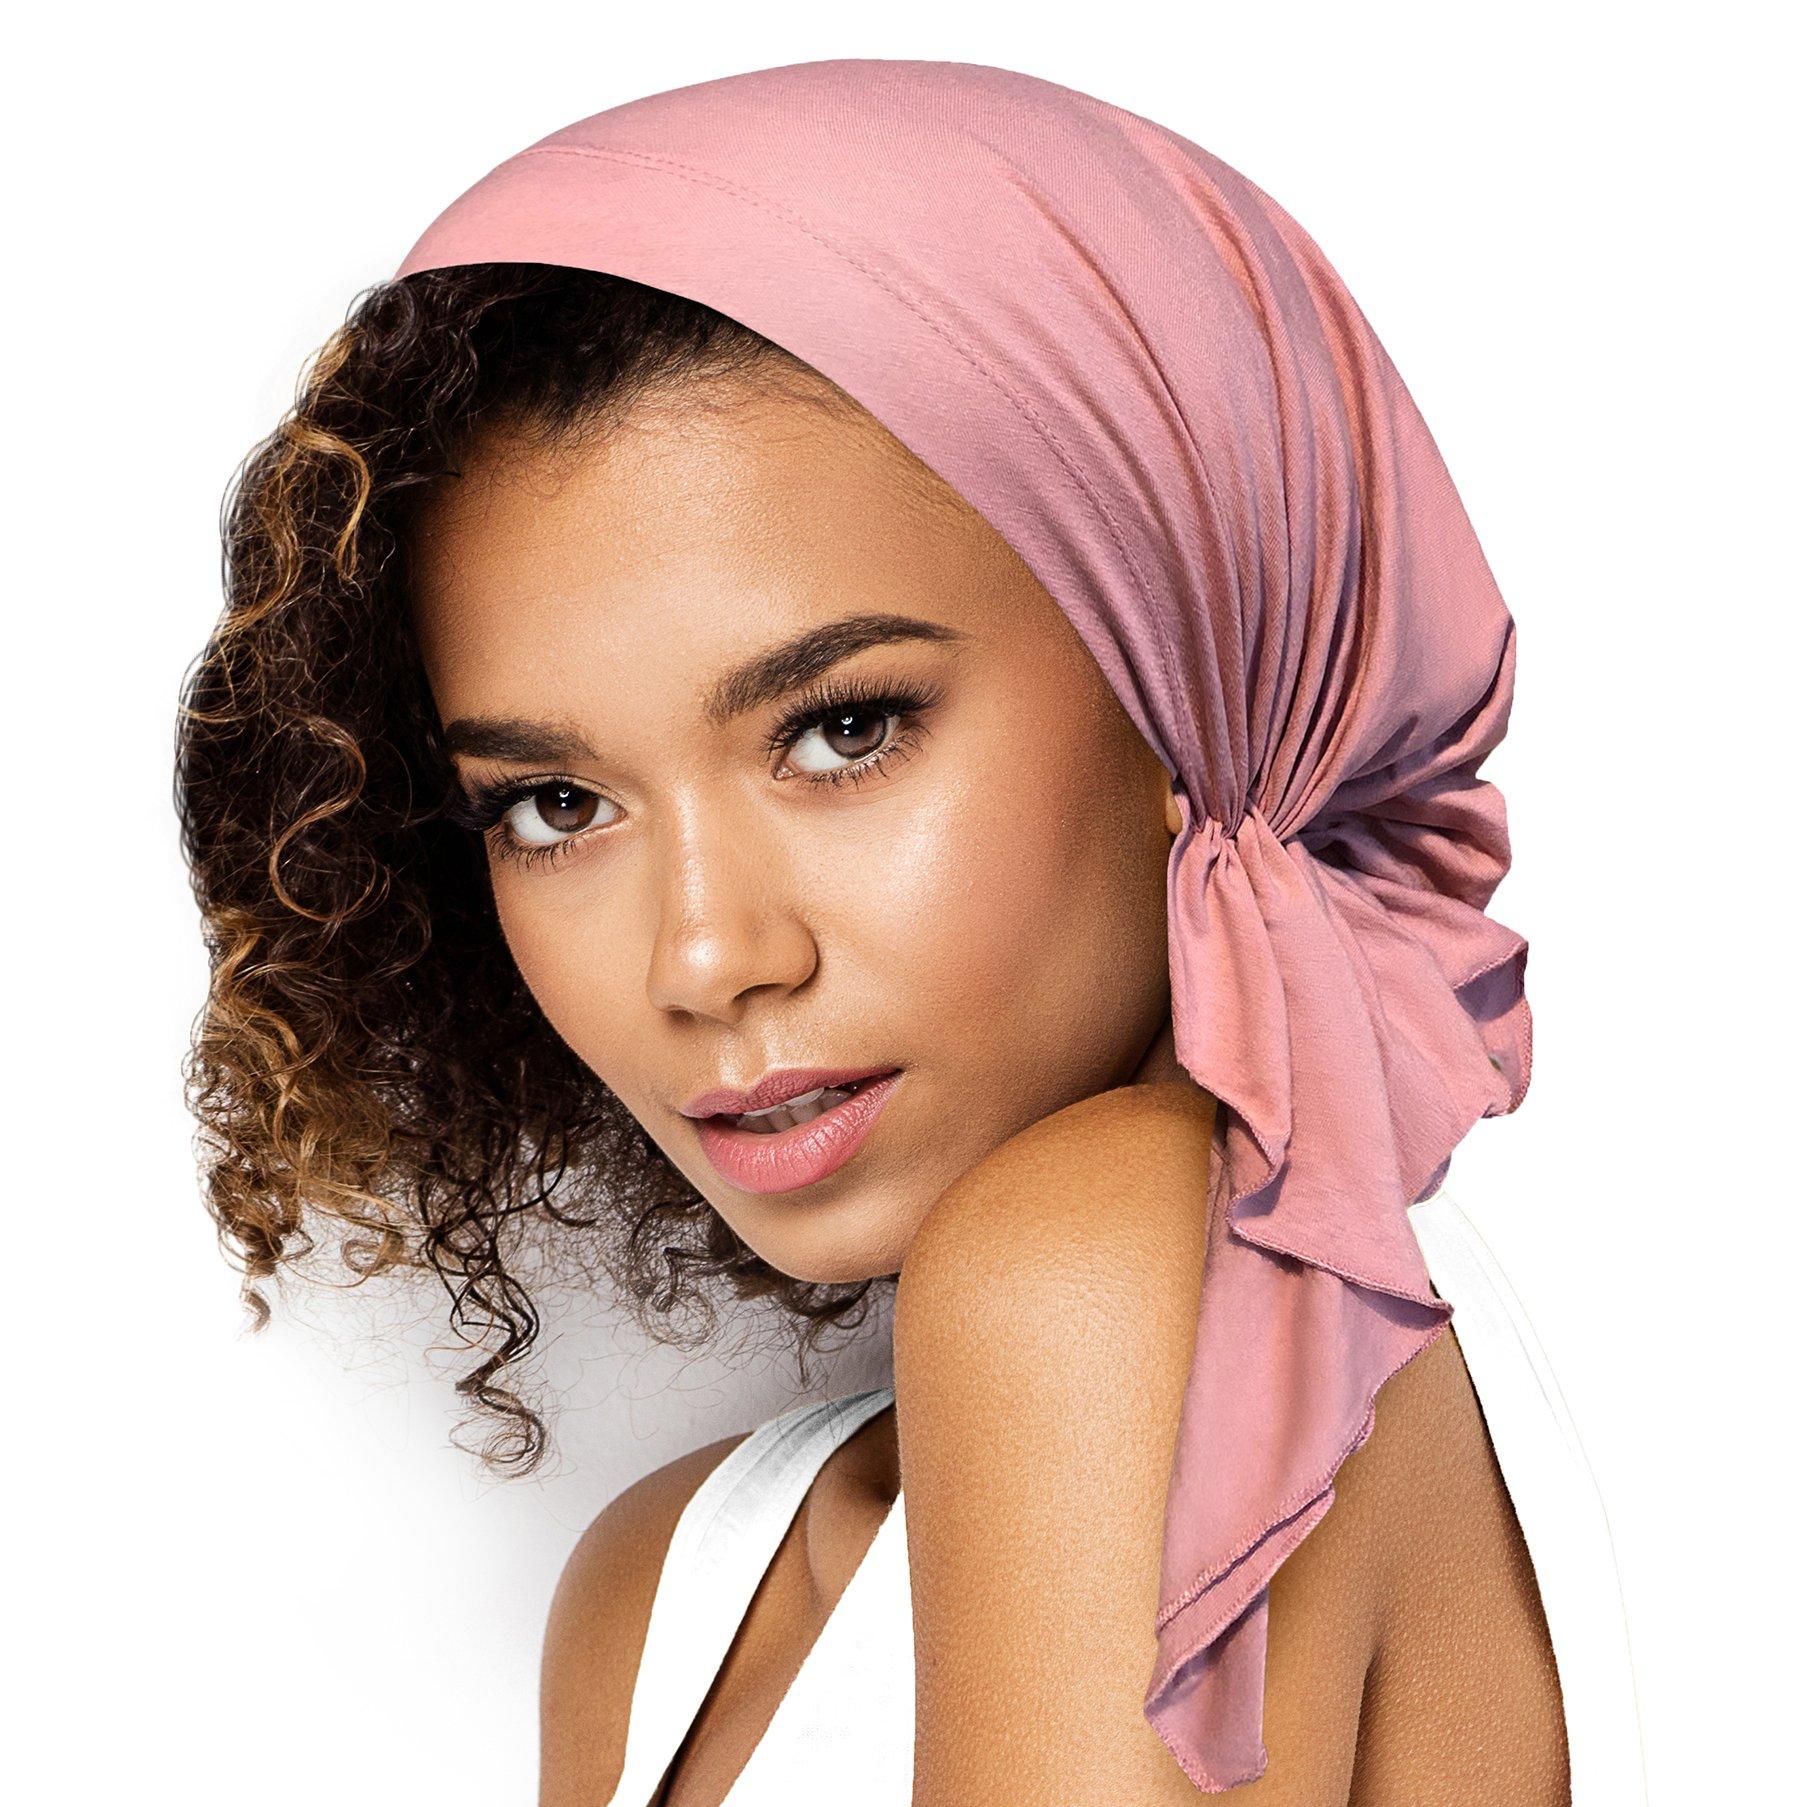 Pre-Tied Cotton Headwear Head-Scarf Chemo Cancer & Tichel Friendly in 30 Colors! (Dusty Pink Short)